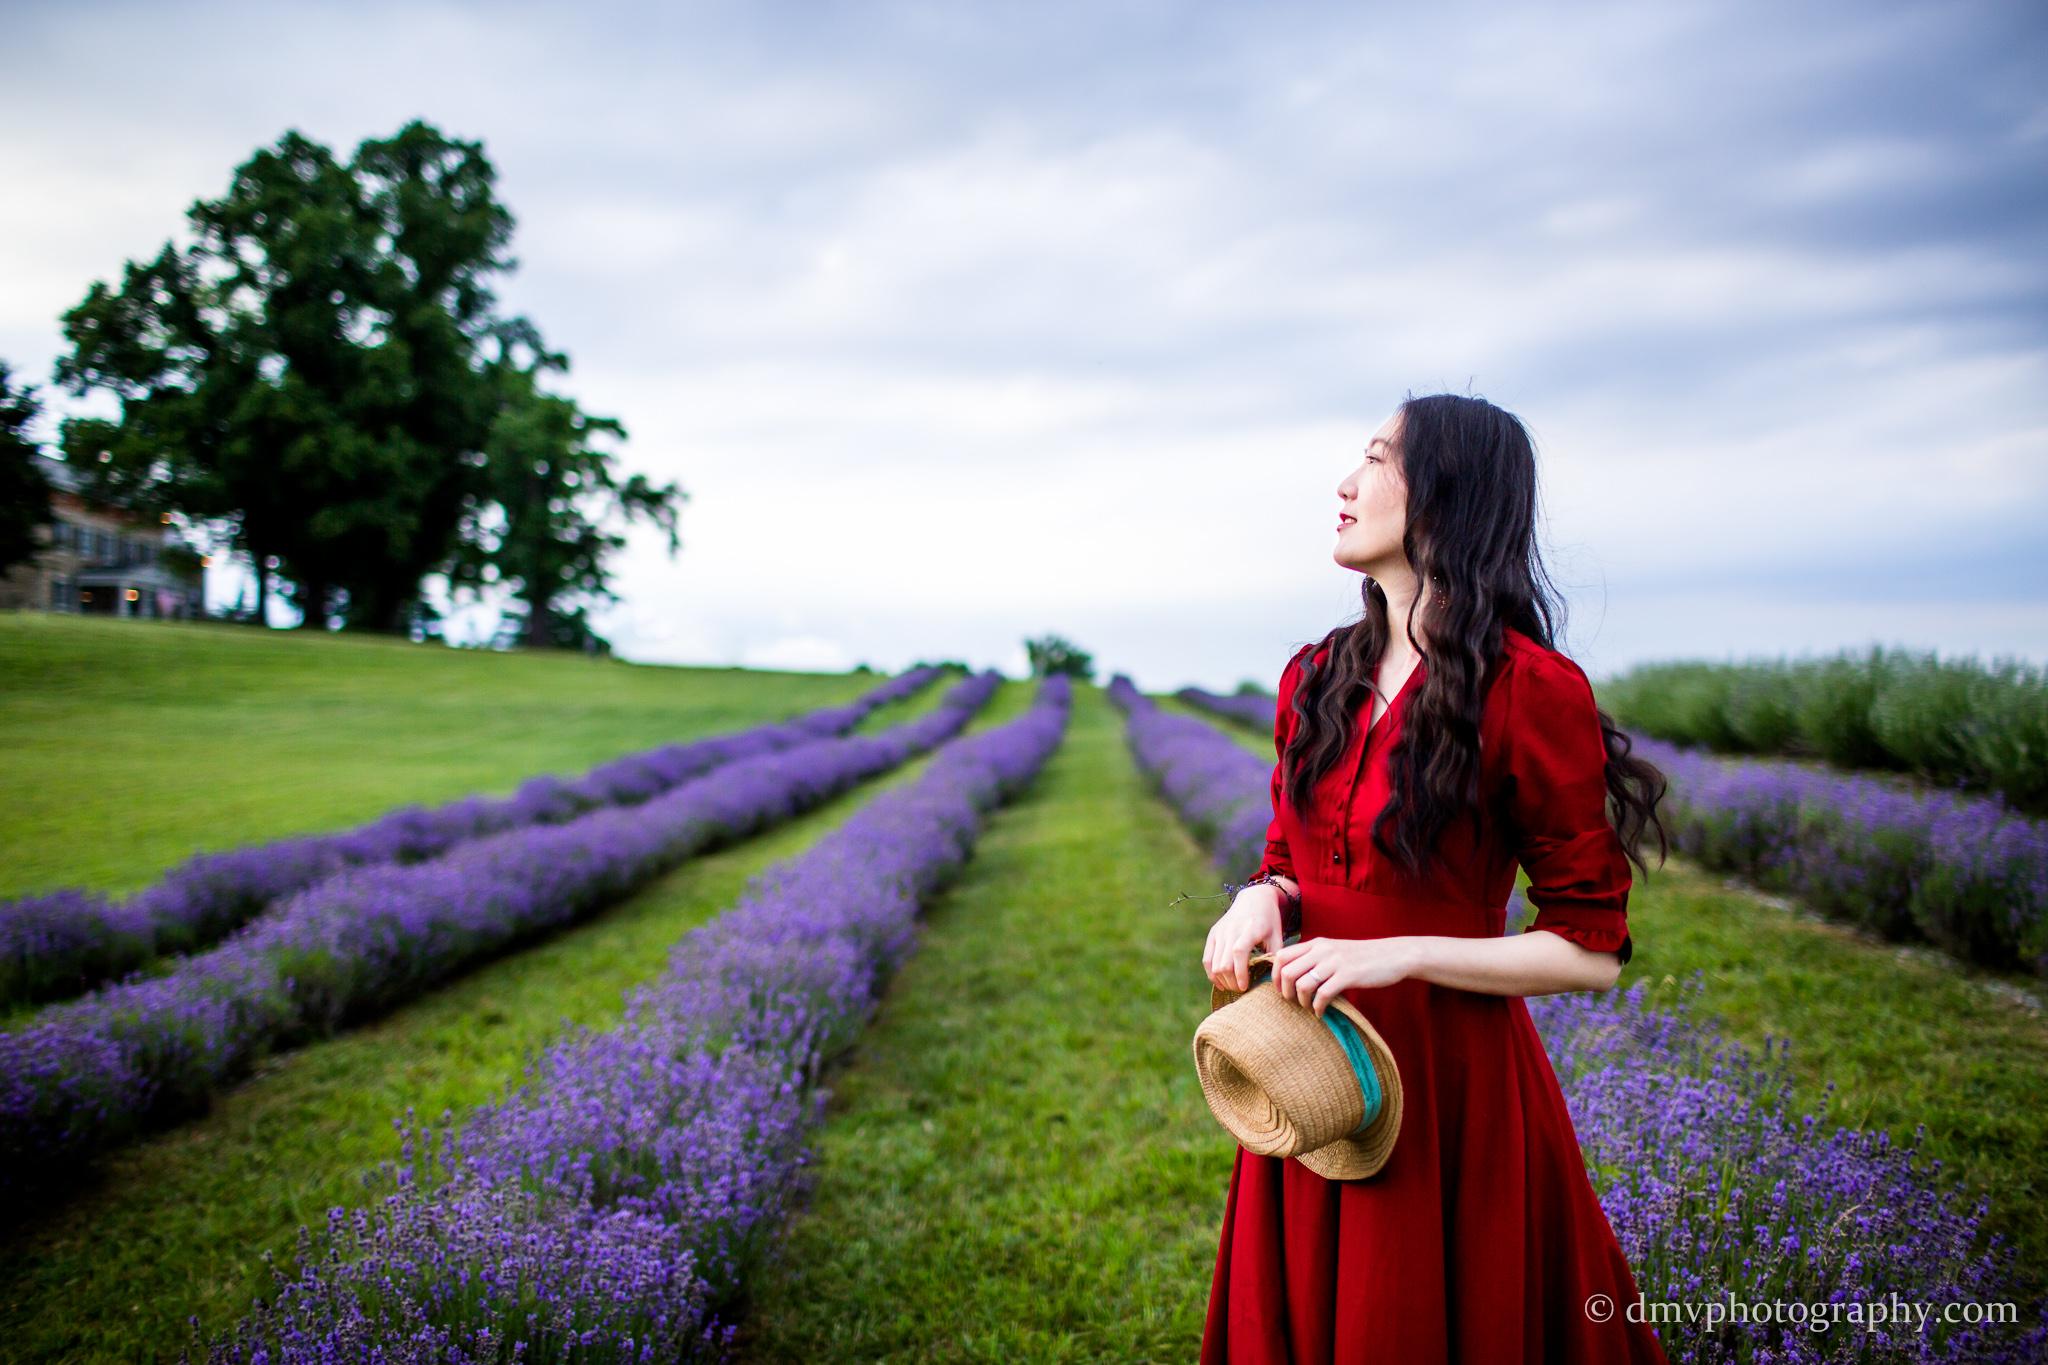 2016-06-24 - Zhu Xing - Lavender Field - 00021